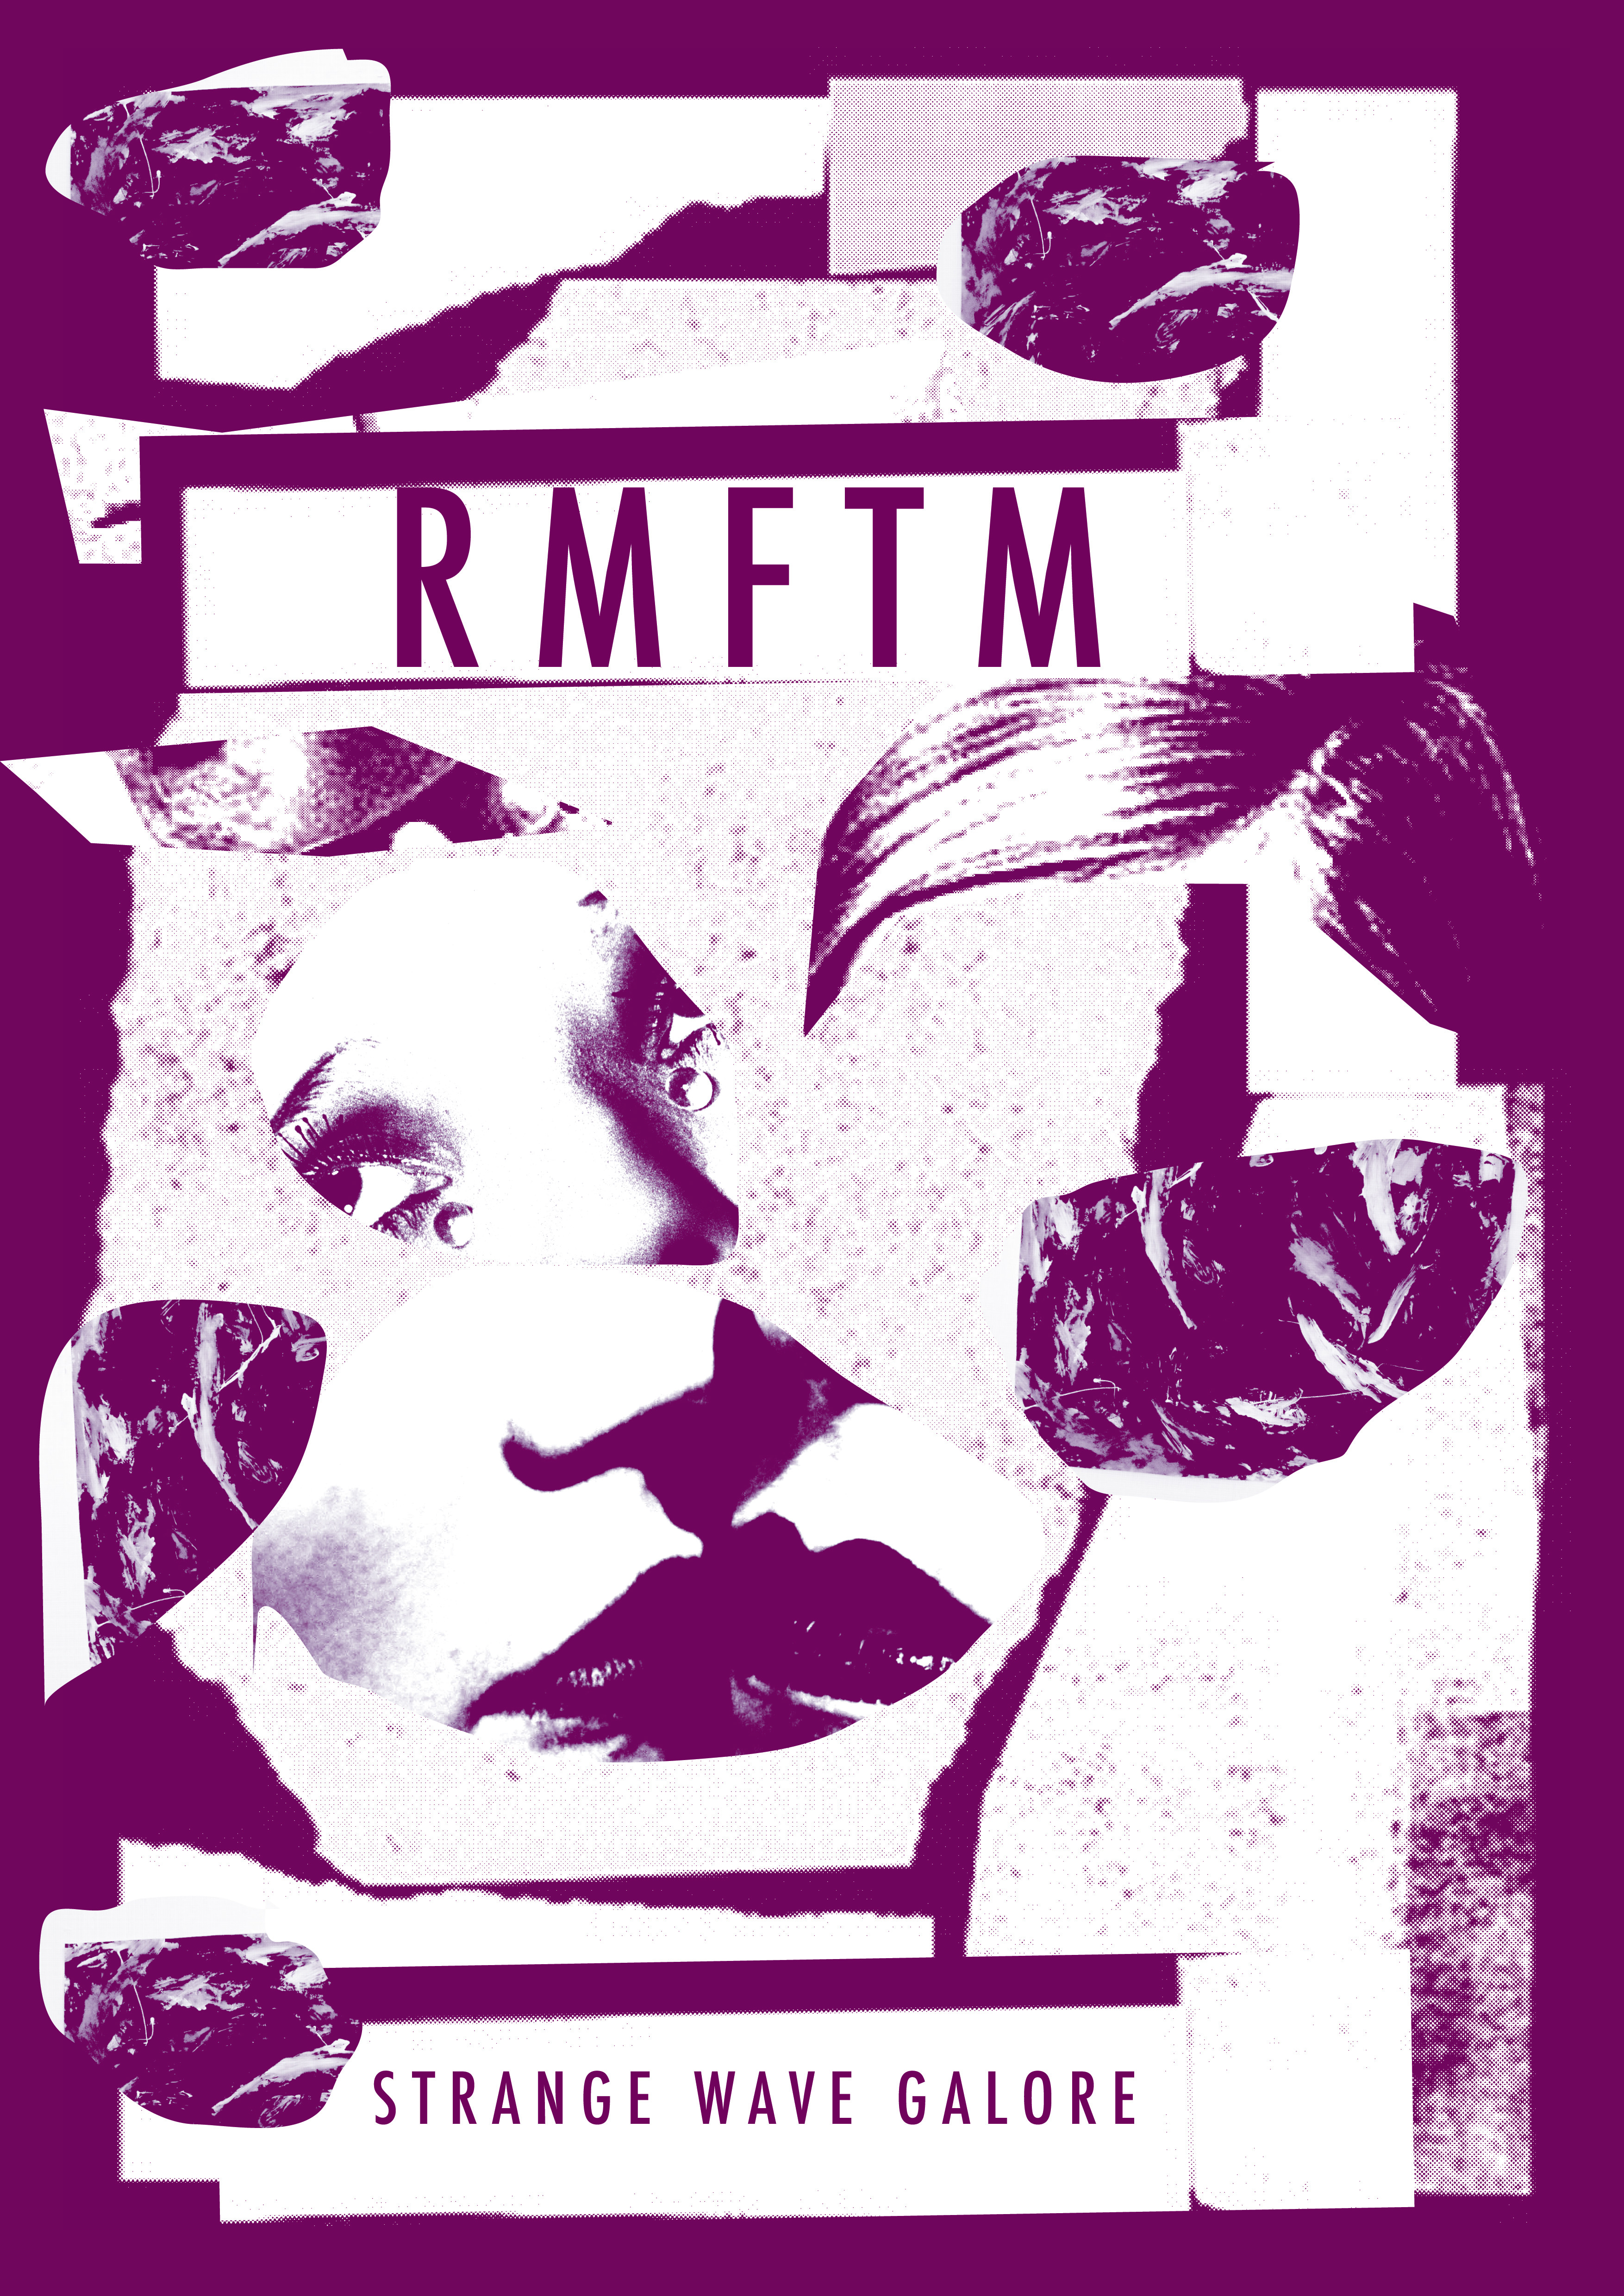 RMFTM_t-shirt_strange